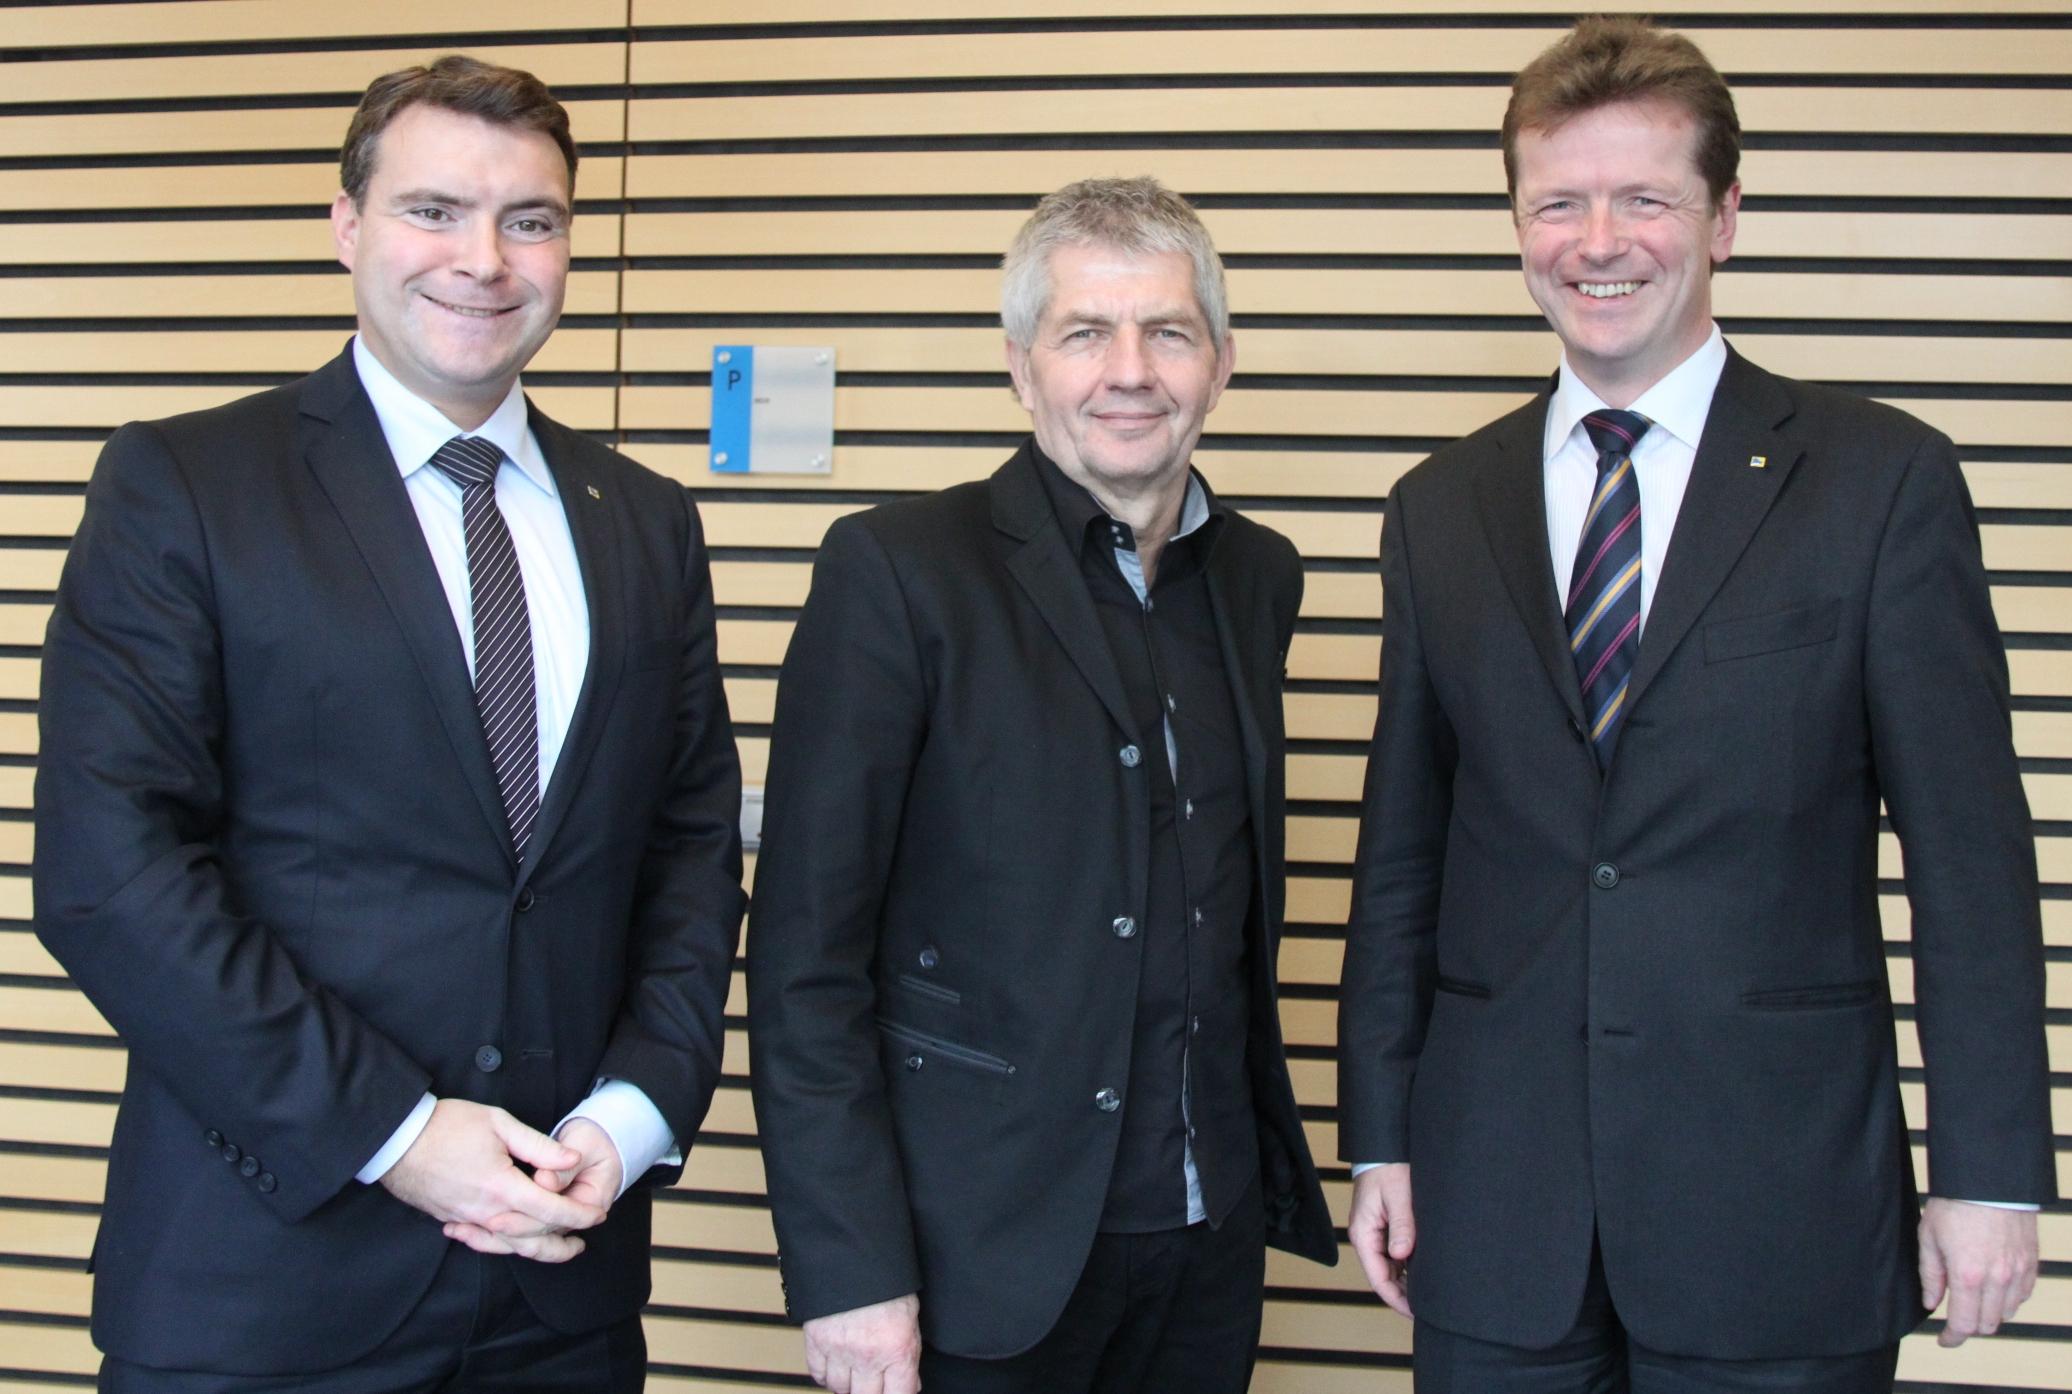 Patrick Kurth, Roland Jahn, Uwe Barth